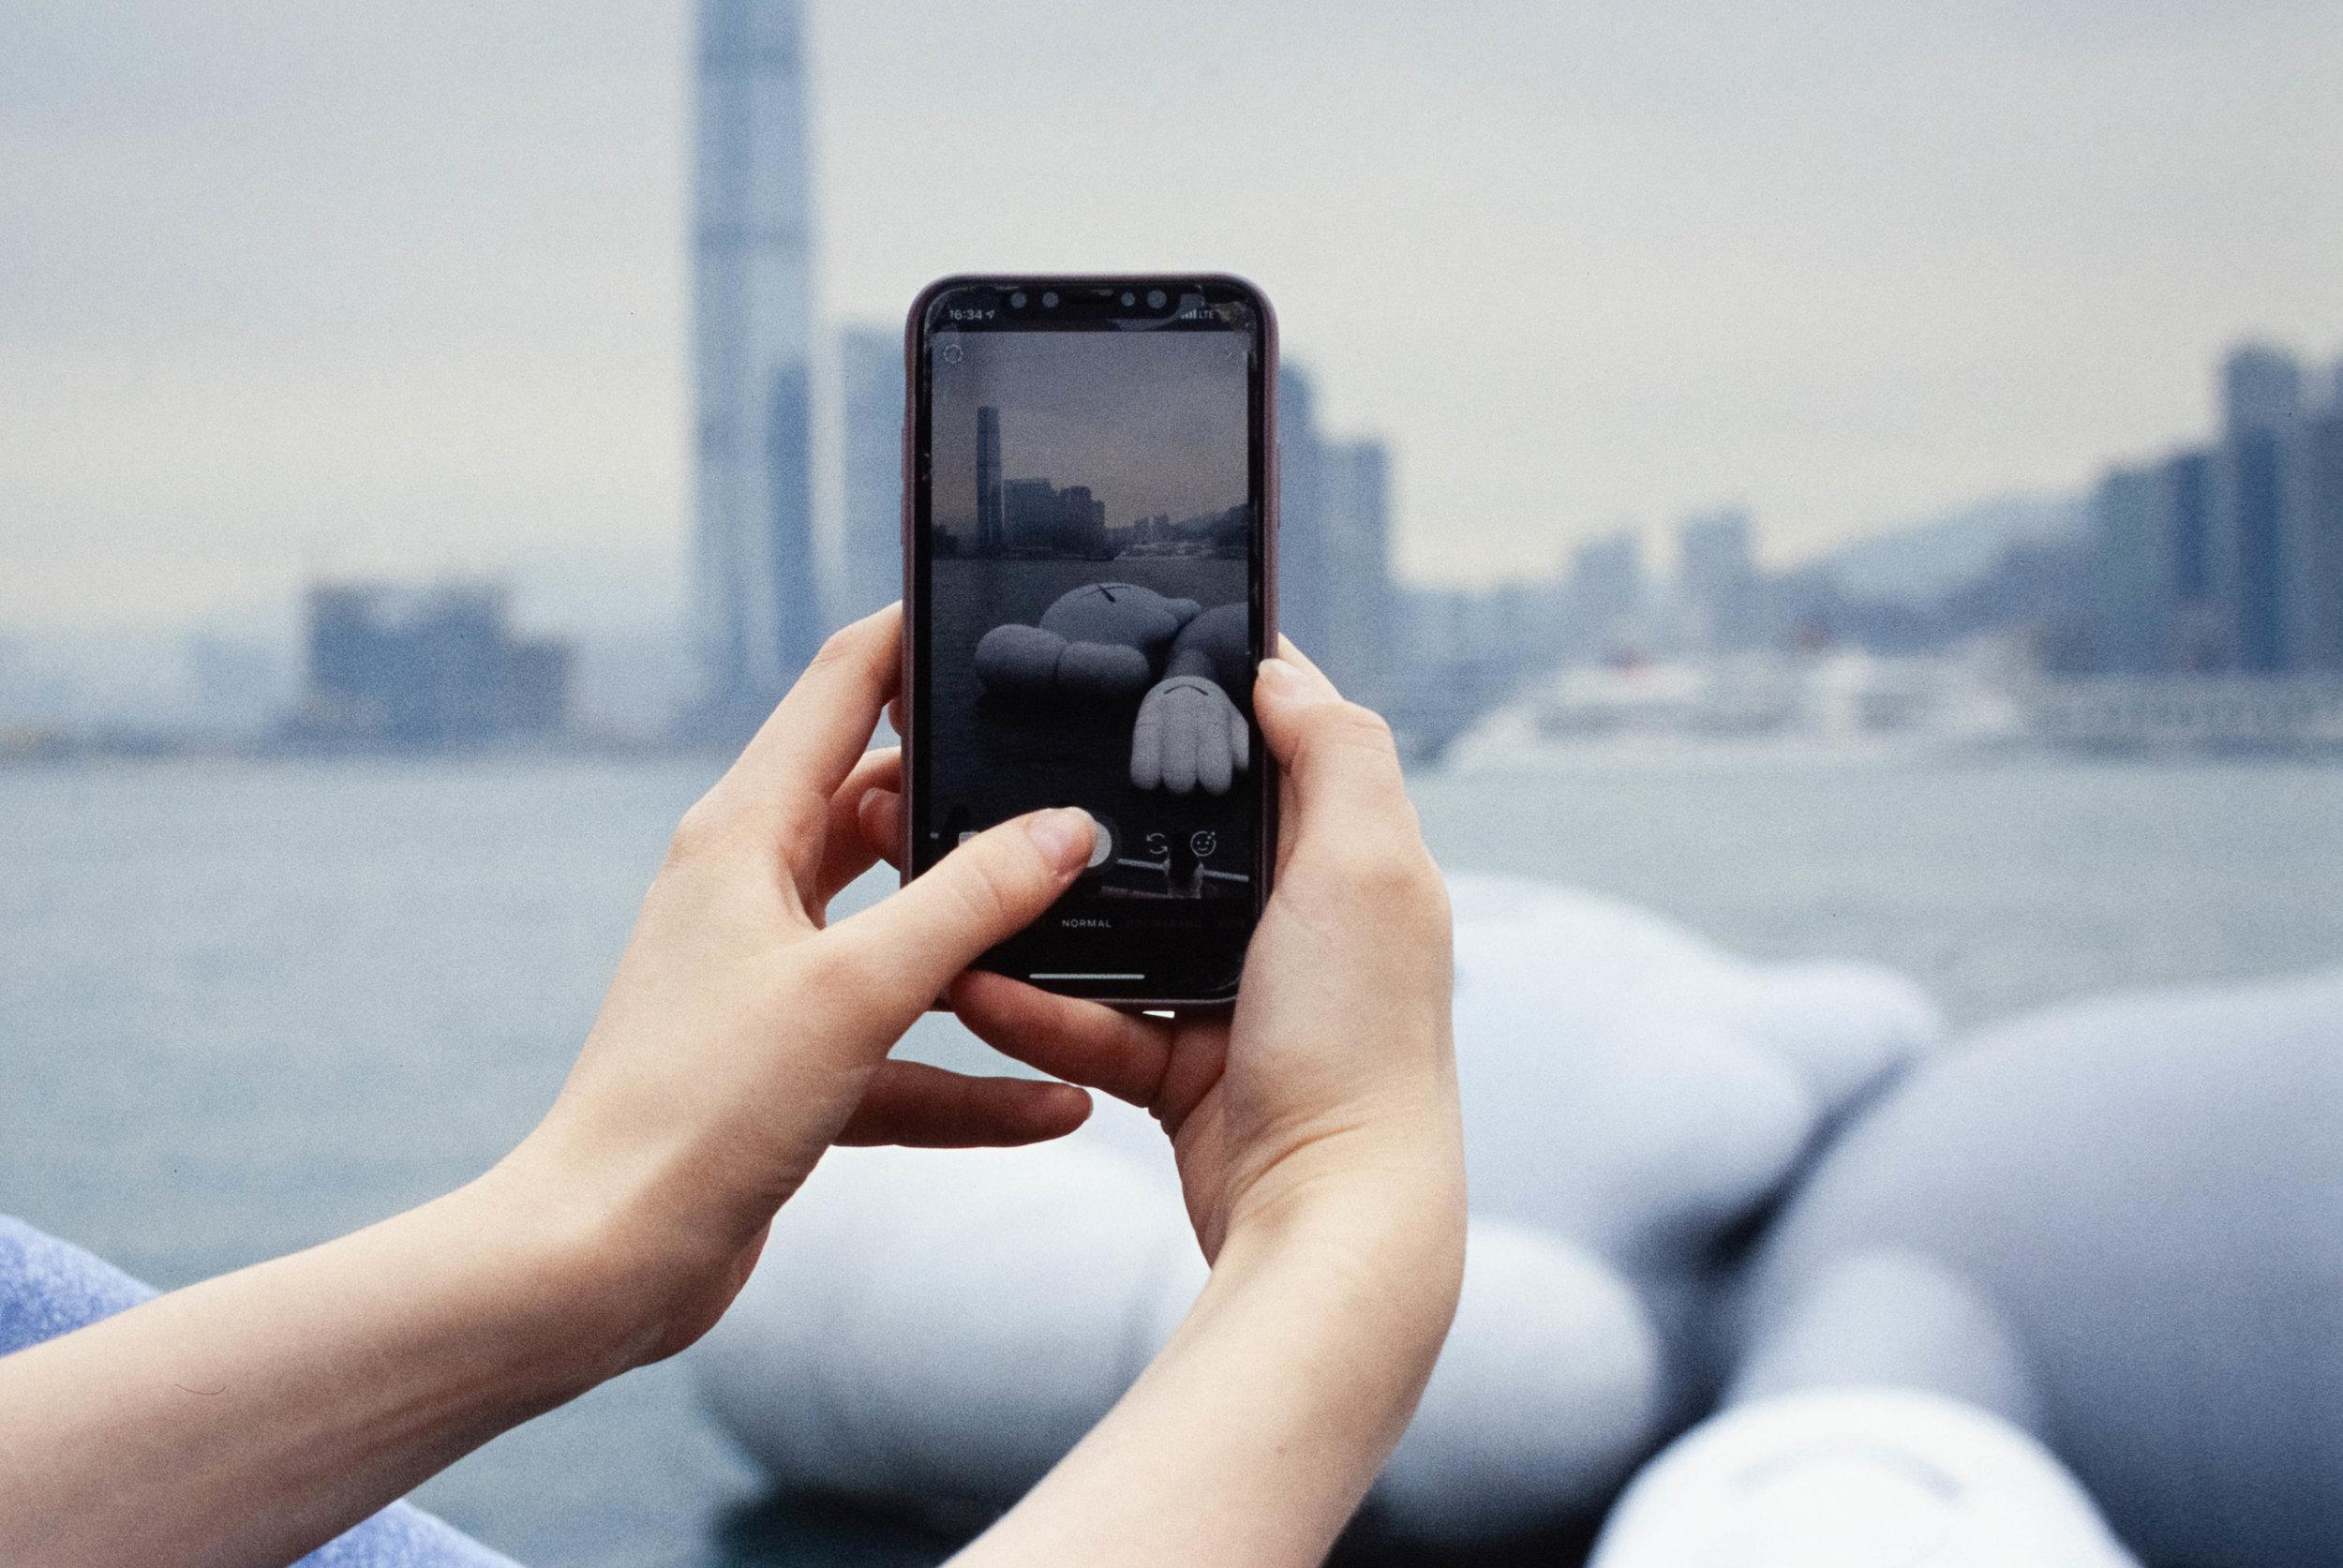 Leica MP Titanium + Leica 50mm f/1.4 Summilux-M ASPH + Fujifilm Provia 400X expiration date unknown